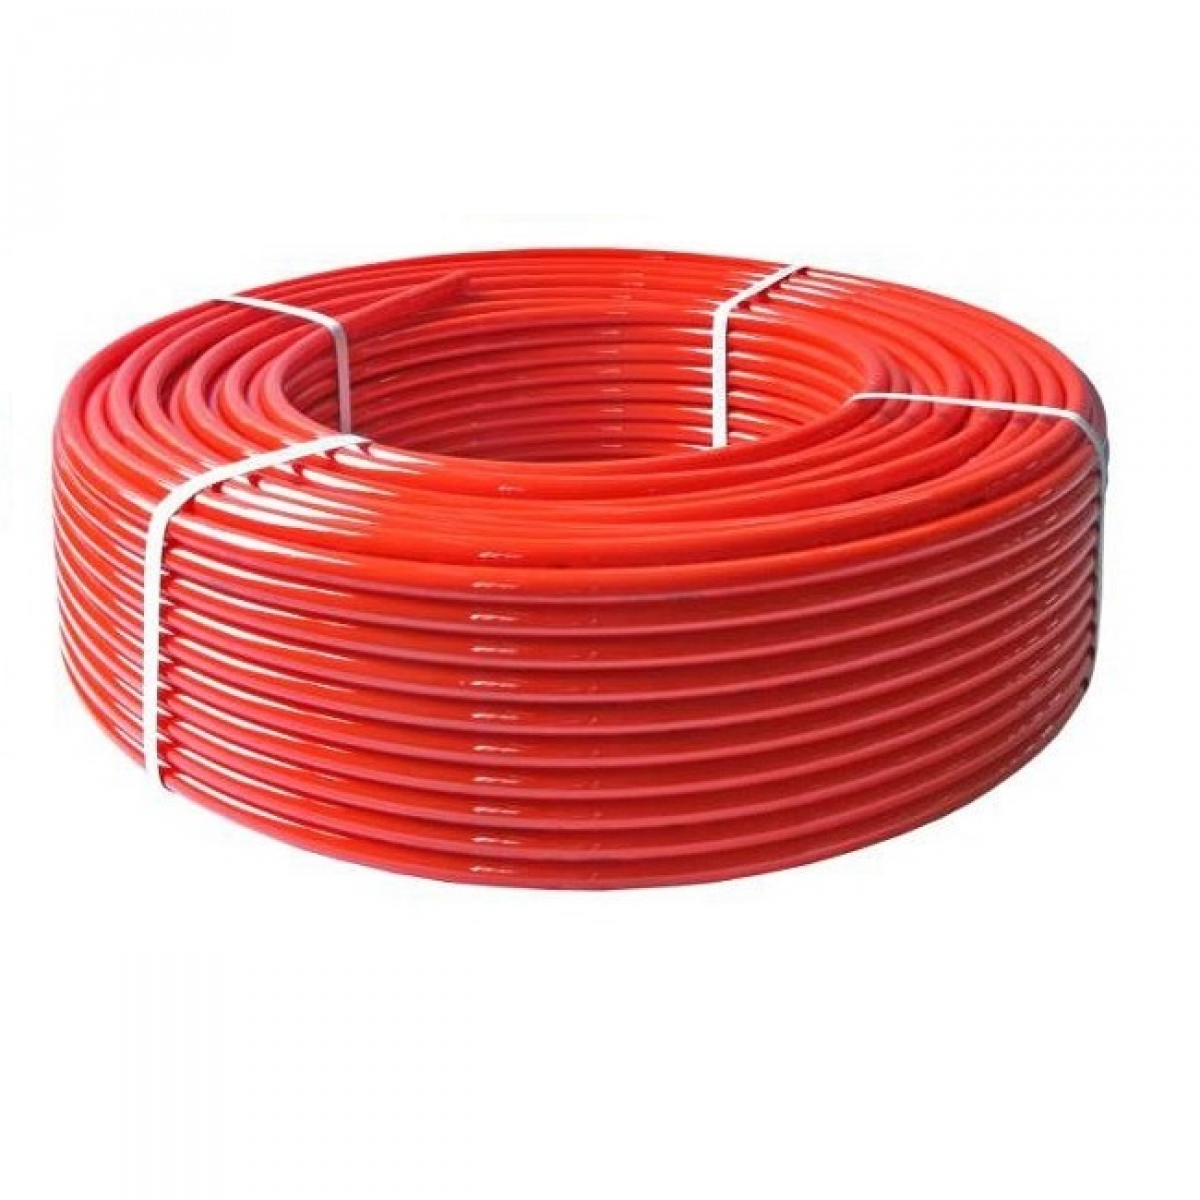 Сшитый полиэтилен диаметр 100